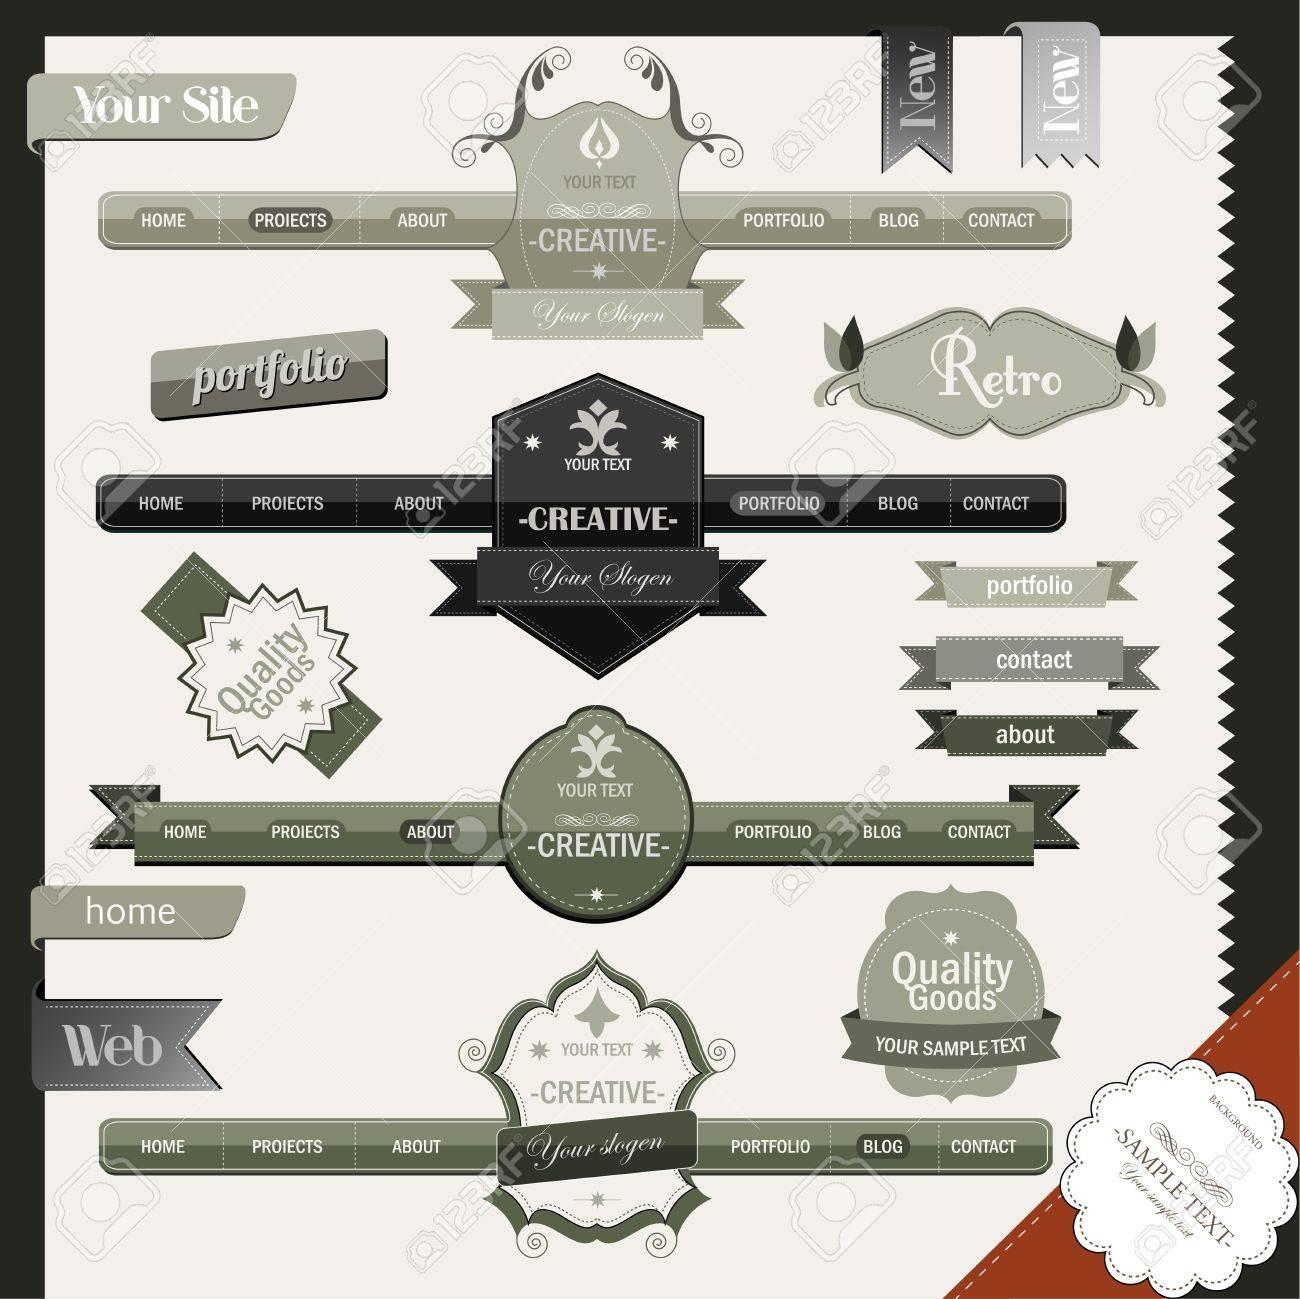 Retro vintage style website elements Stock Vector - 16967544